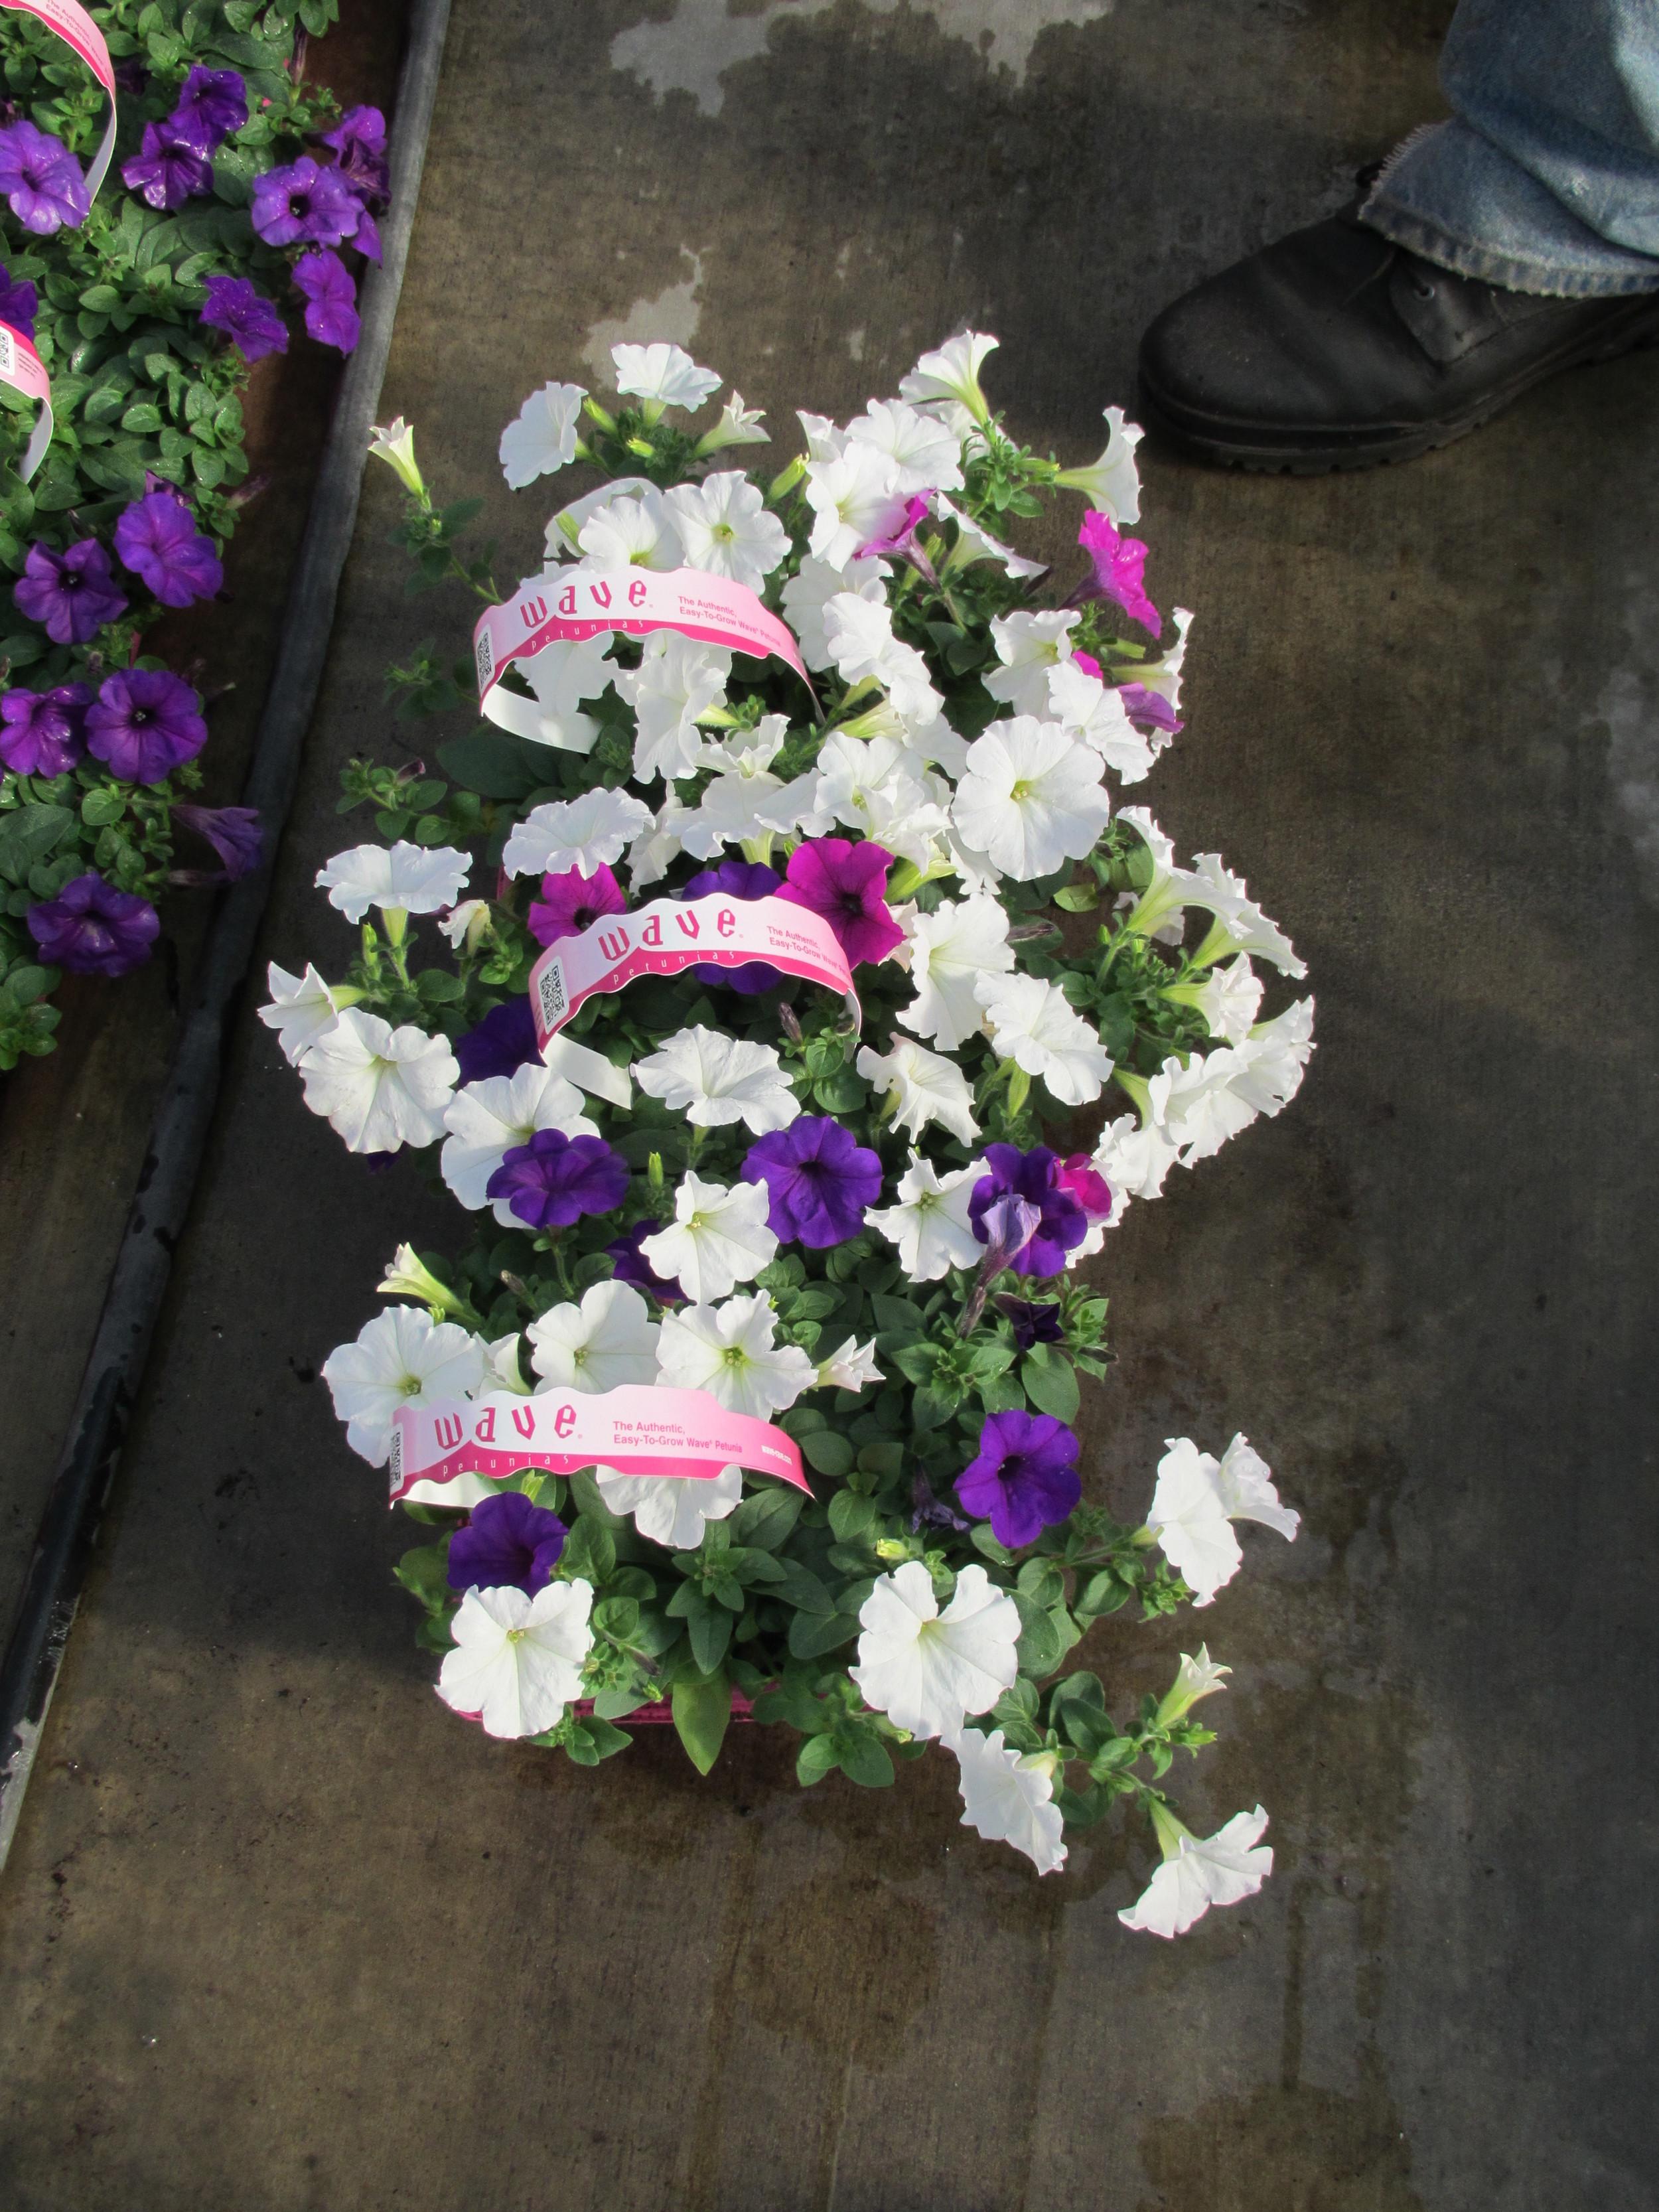 306 Wave Petunia White Purple Randys 040213.JPG